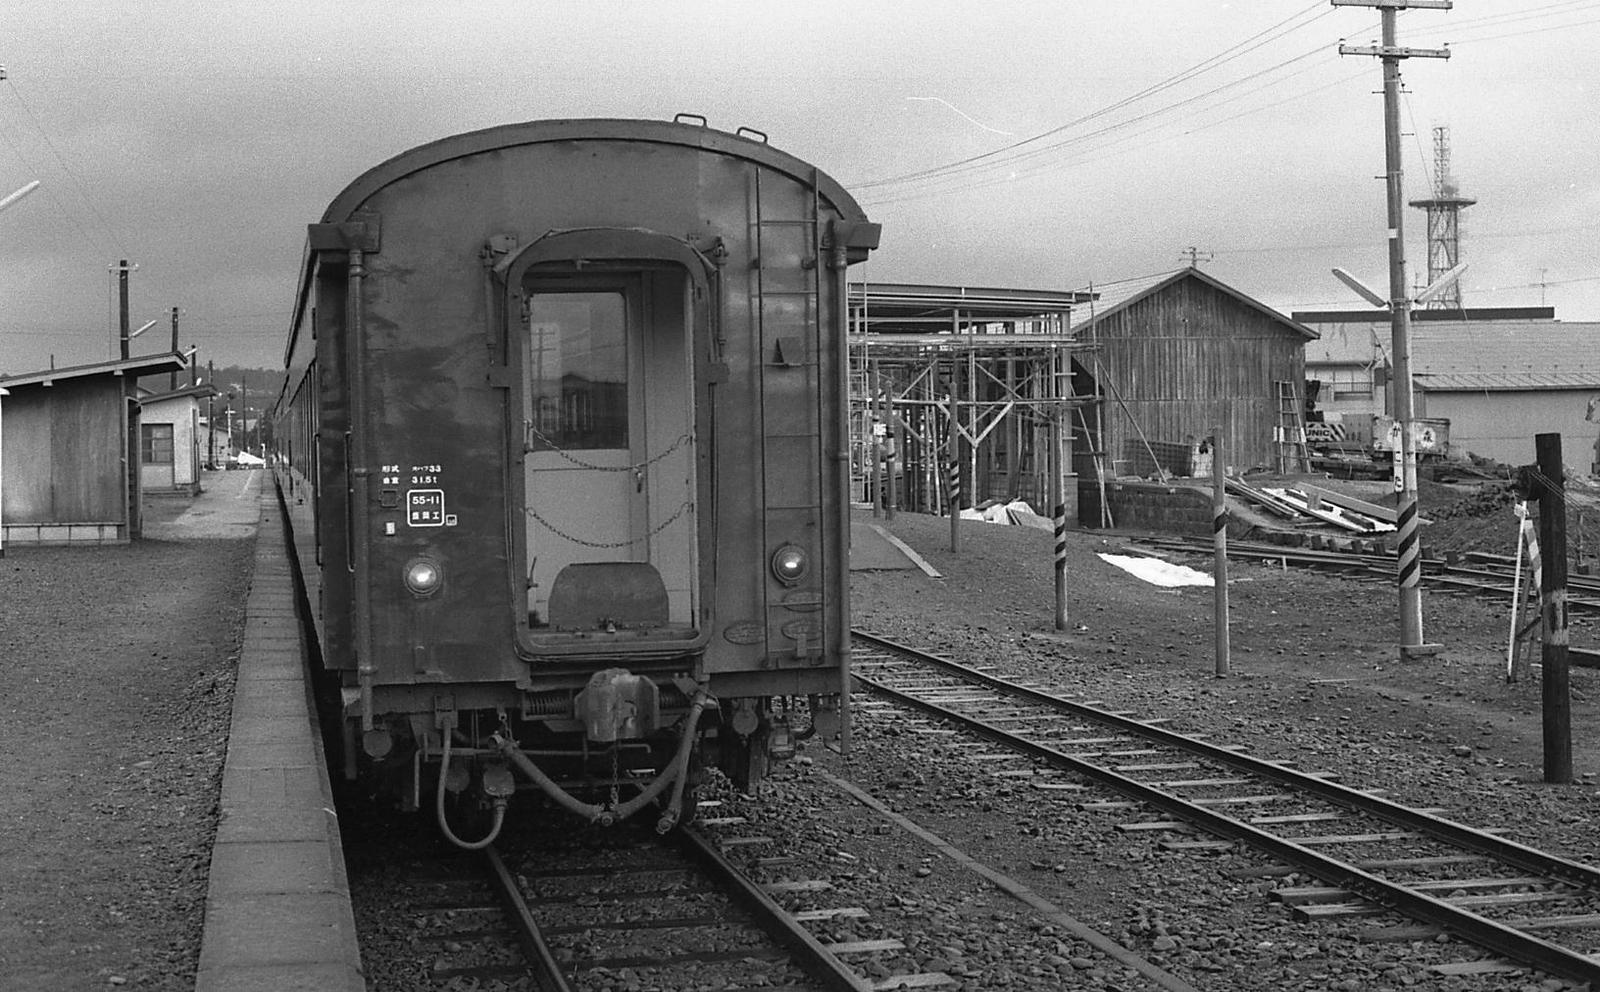 19820324a03